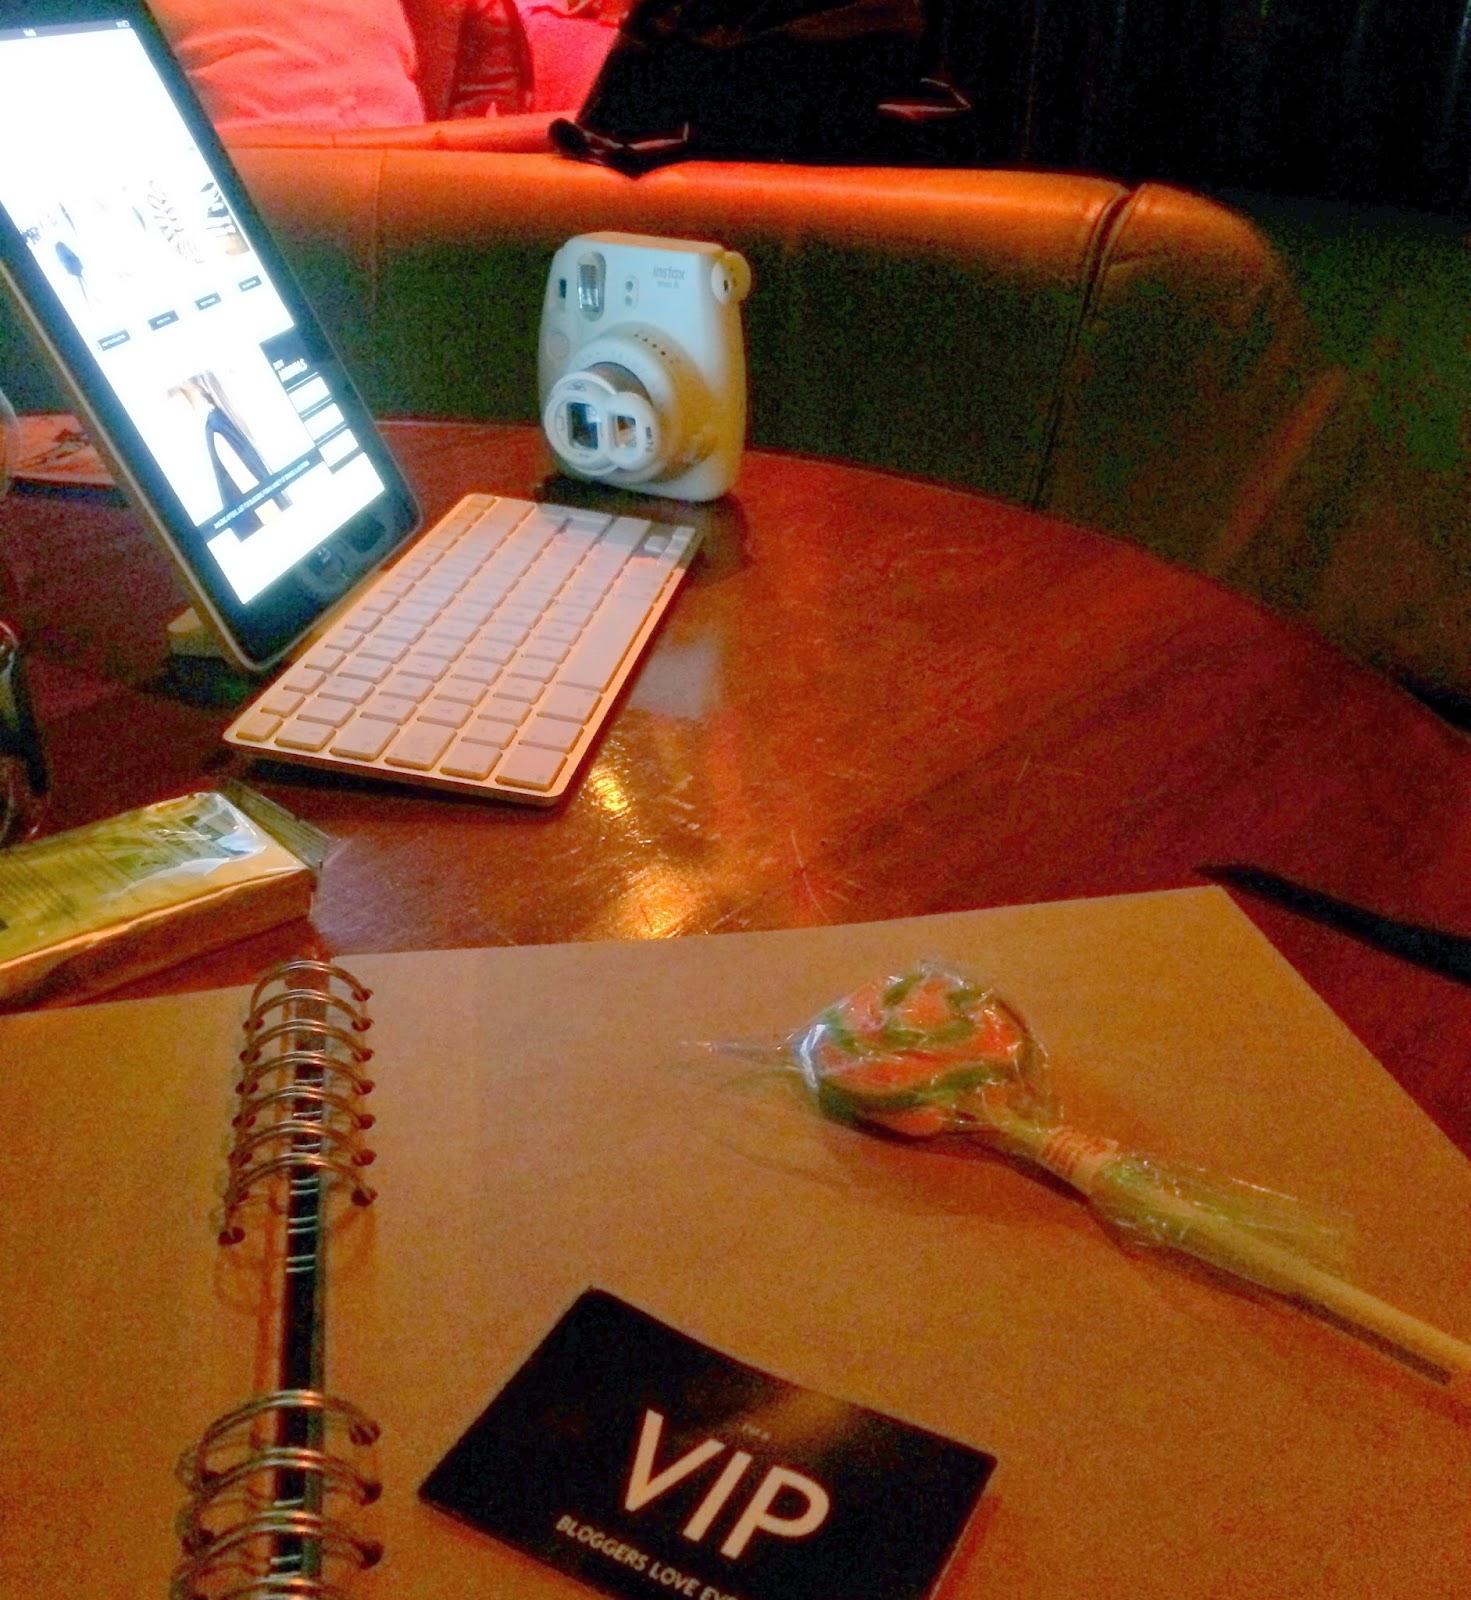 bloggers-love-hub-london-2014